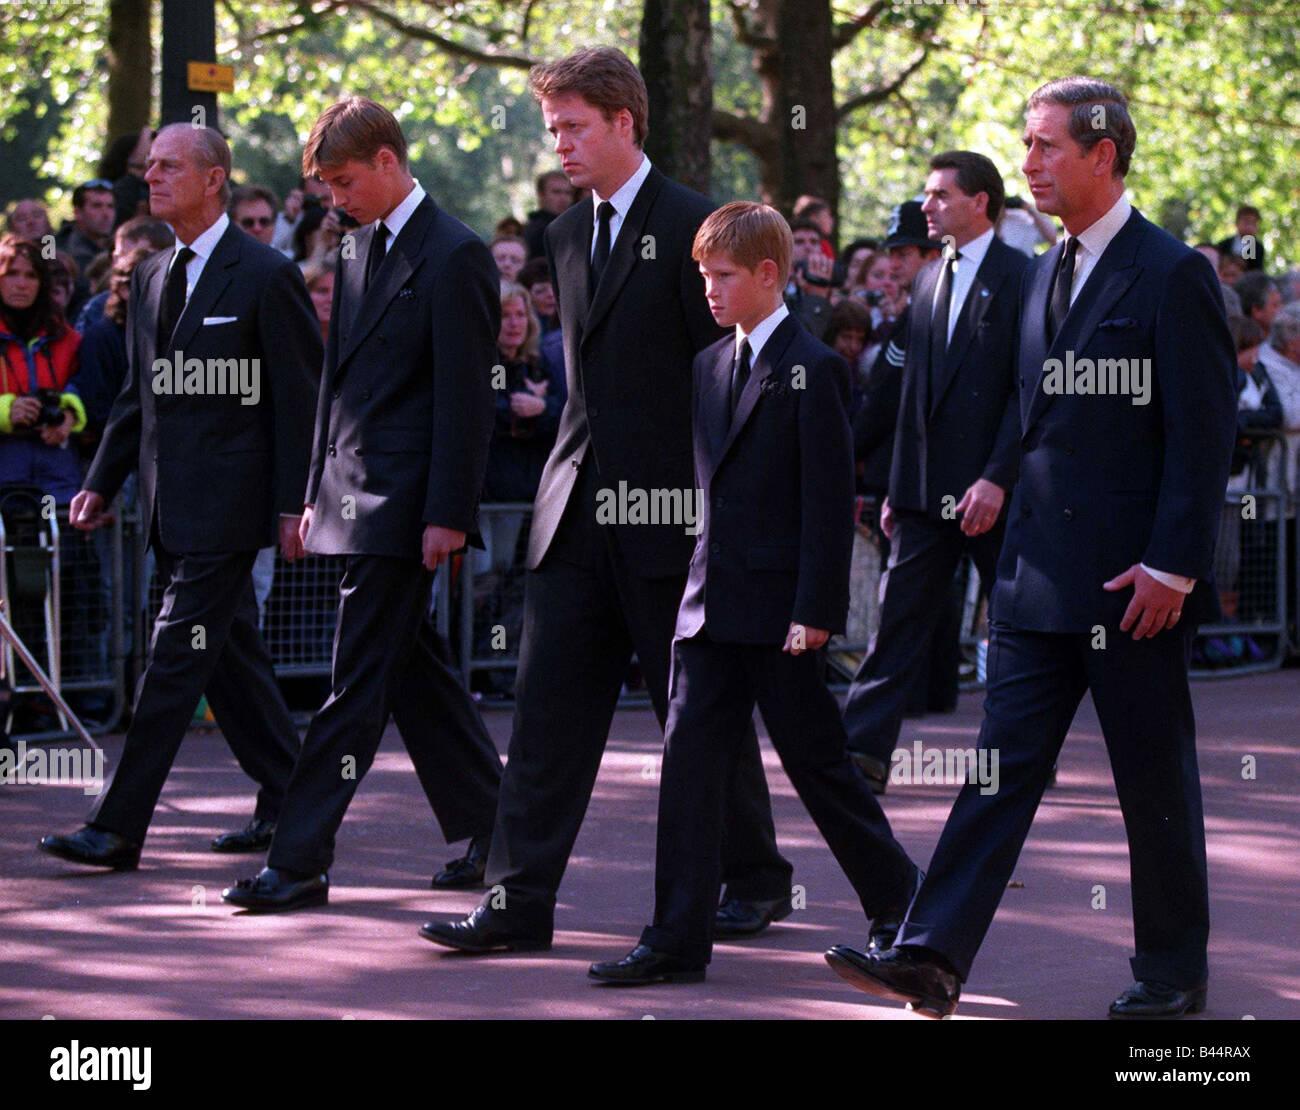 Princess Diana Funeral 6 September 1997 Prince Charles Prince